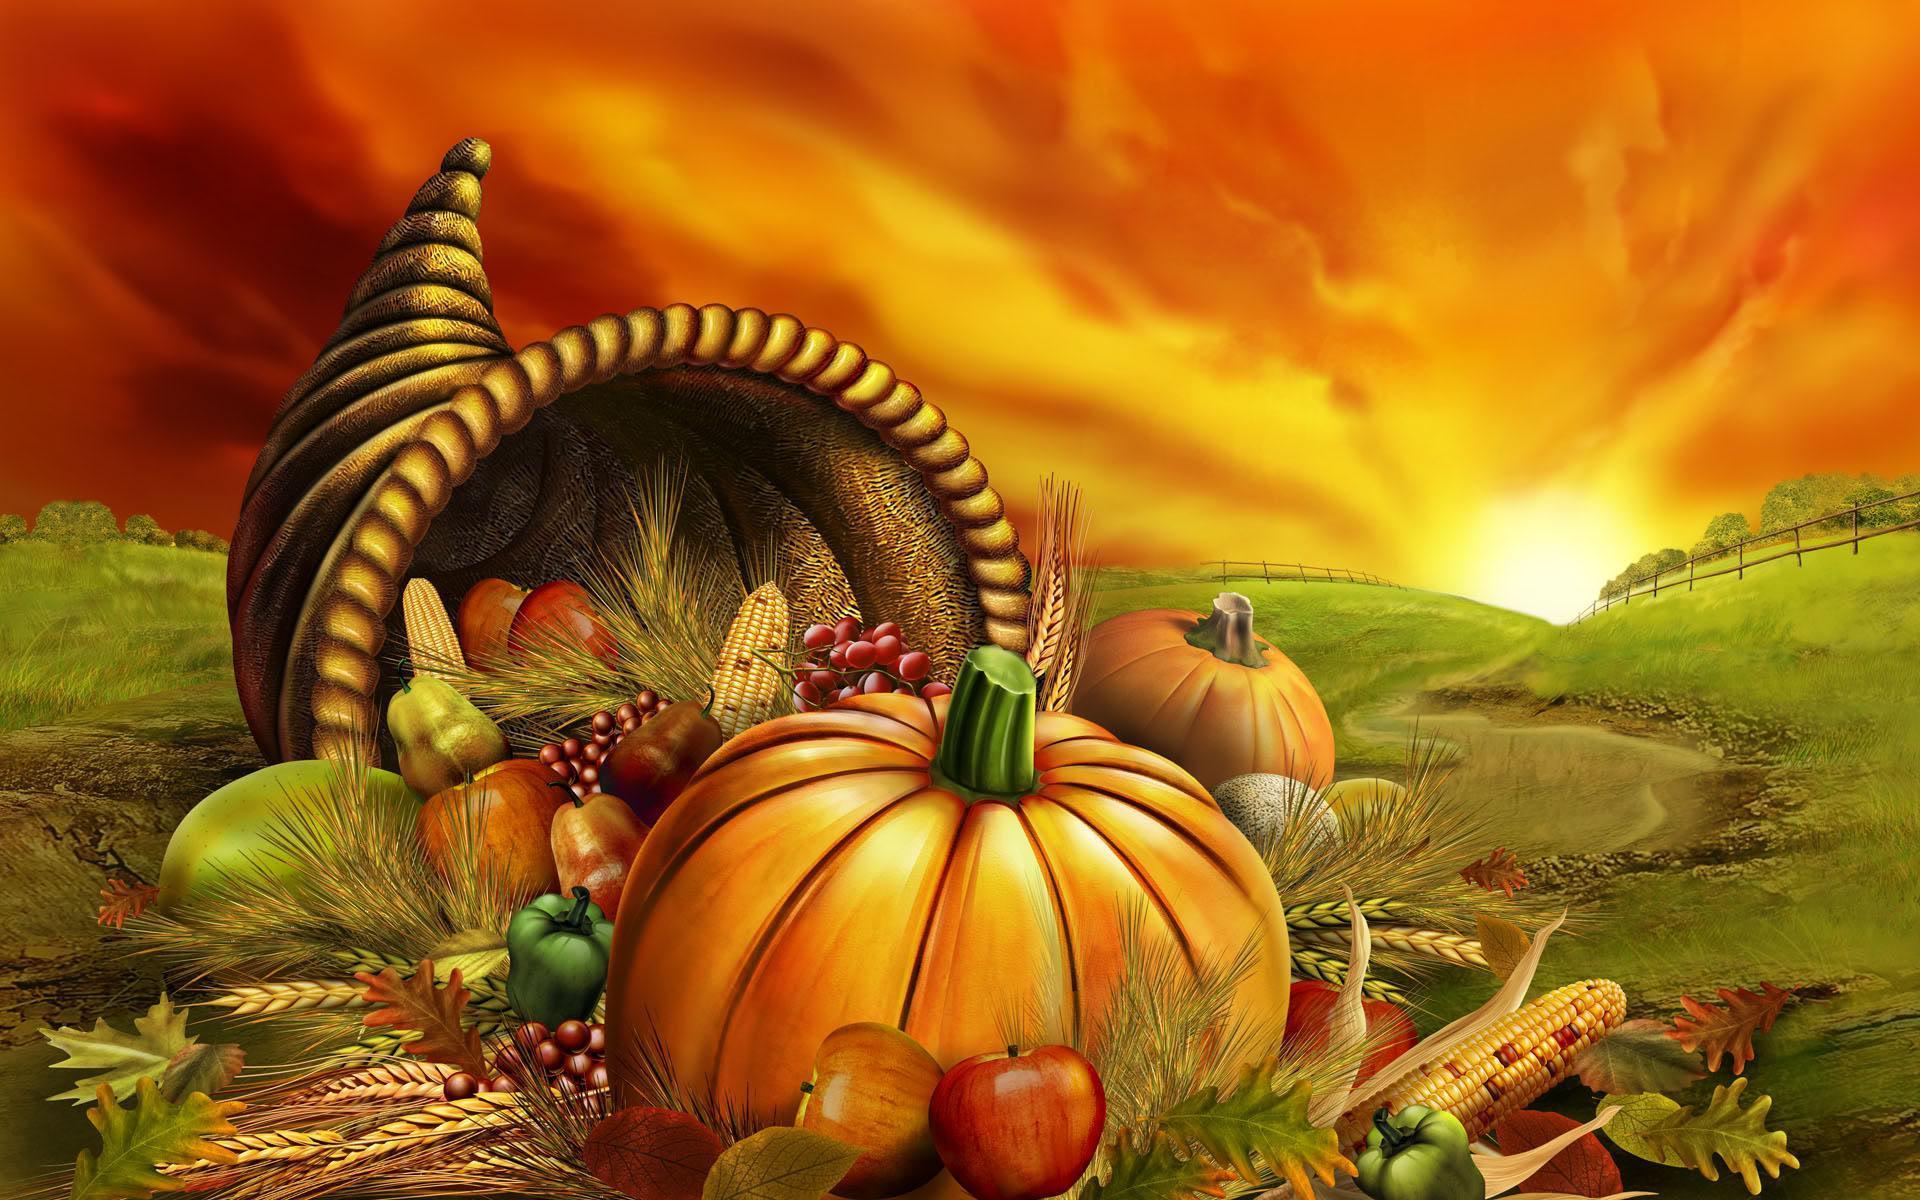 hd_thanksgiving_wallpapers_008.jpg